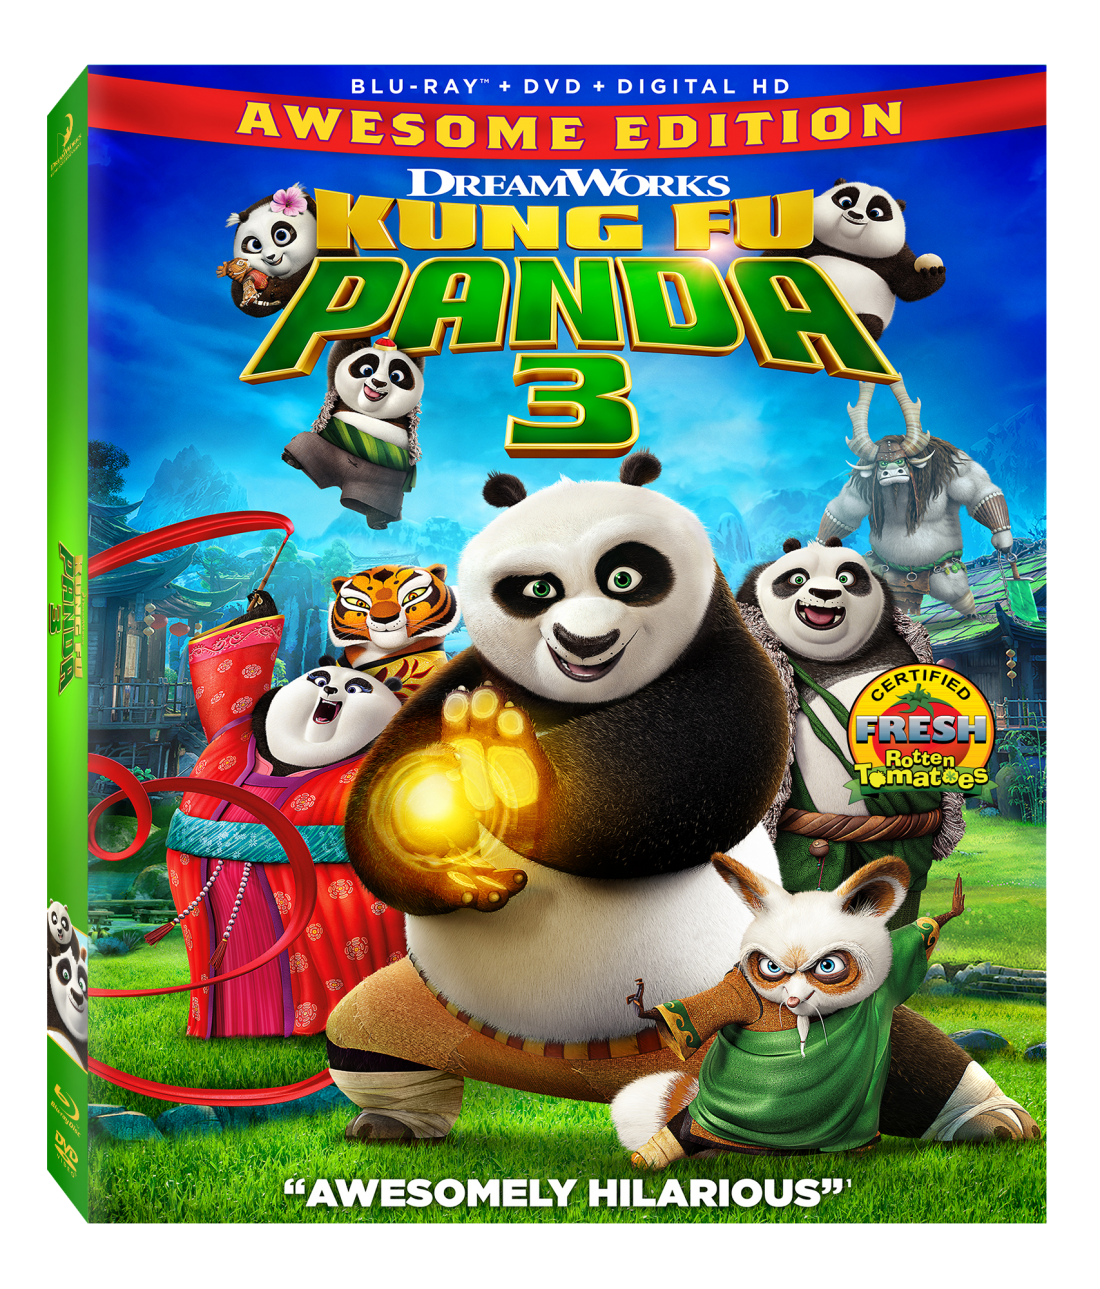 Kung Fu Panda 3 Awesome Edition Blu Ray Giveaway Pandainsiders Kung Fu Panda 3 Kung Fu Panda Kung Fu